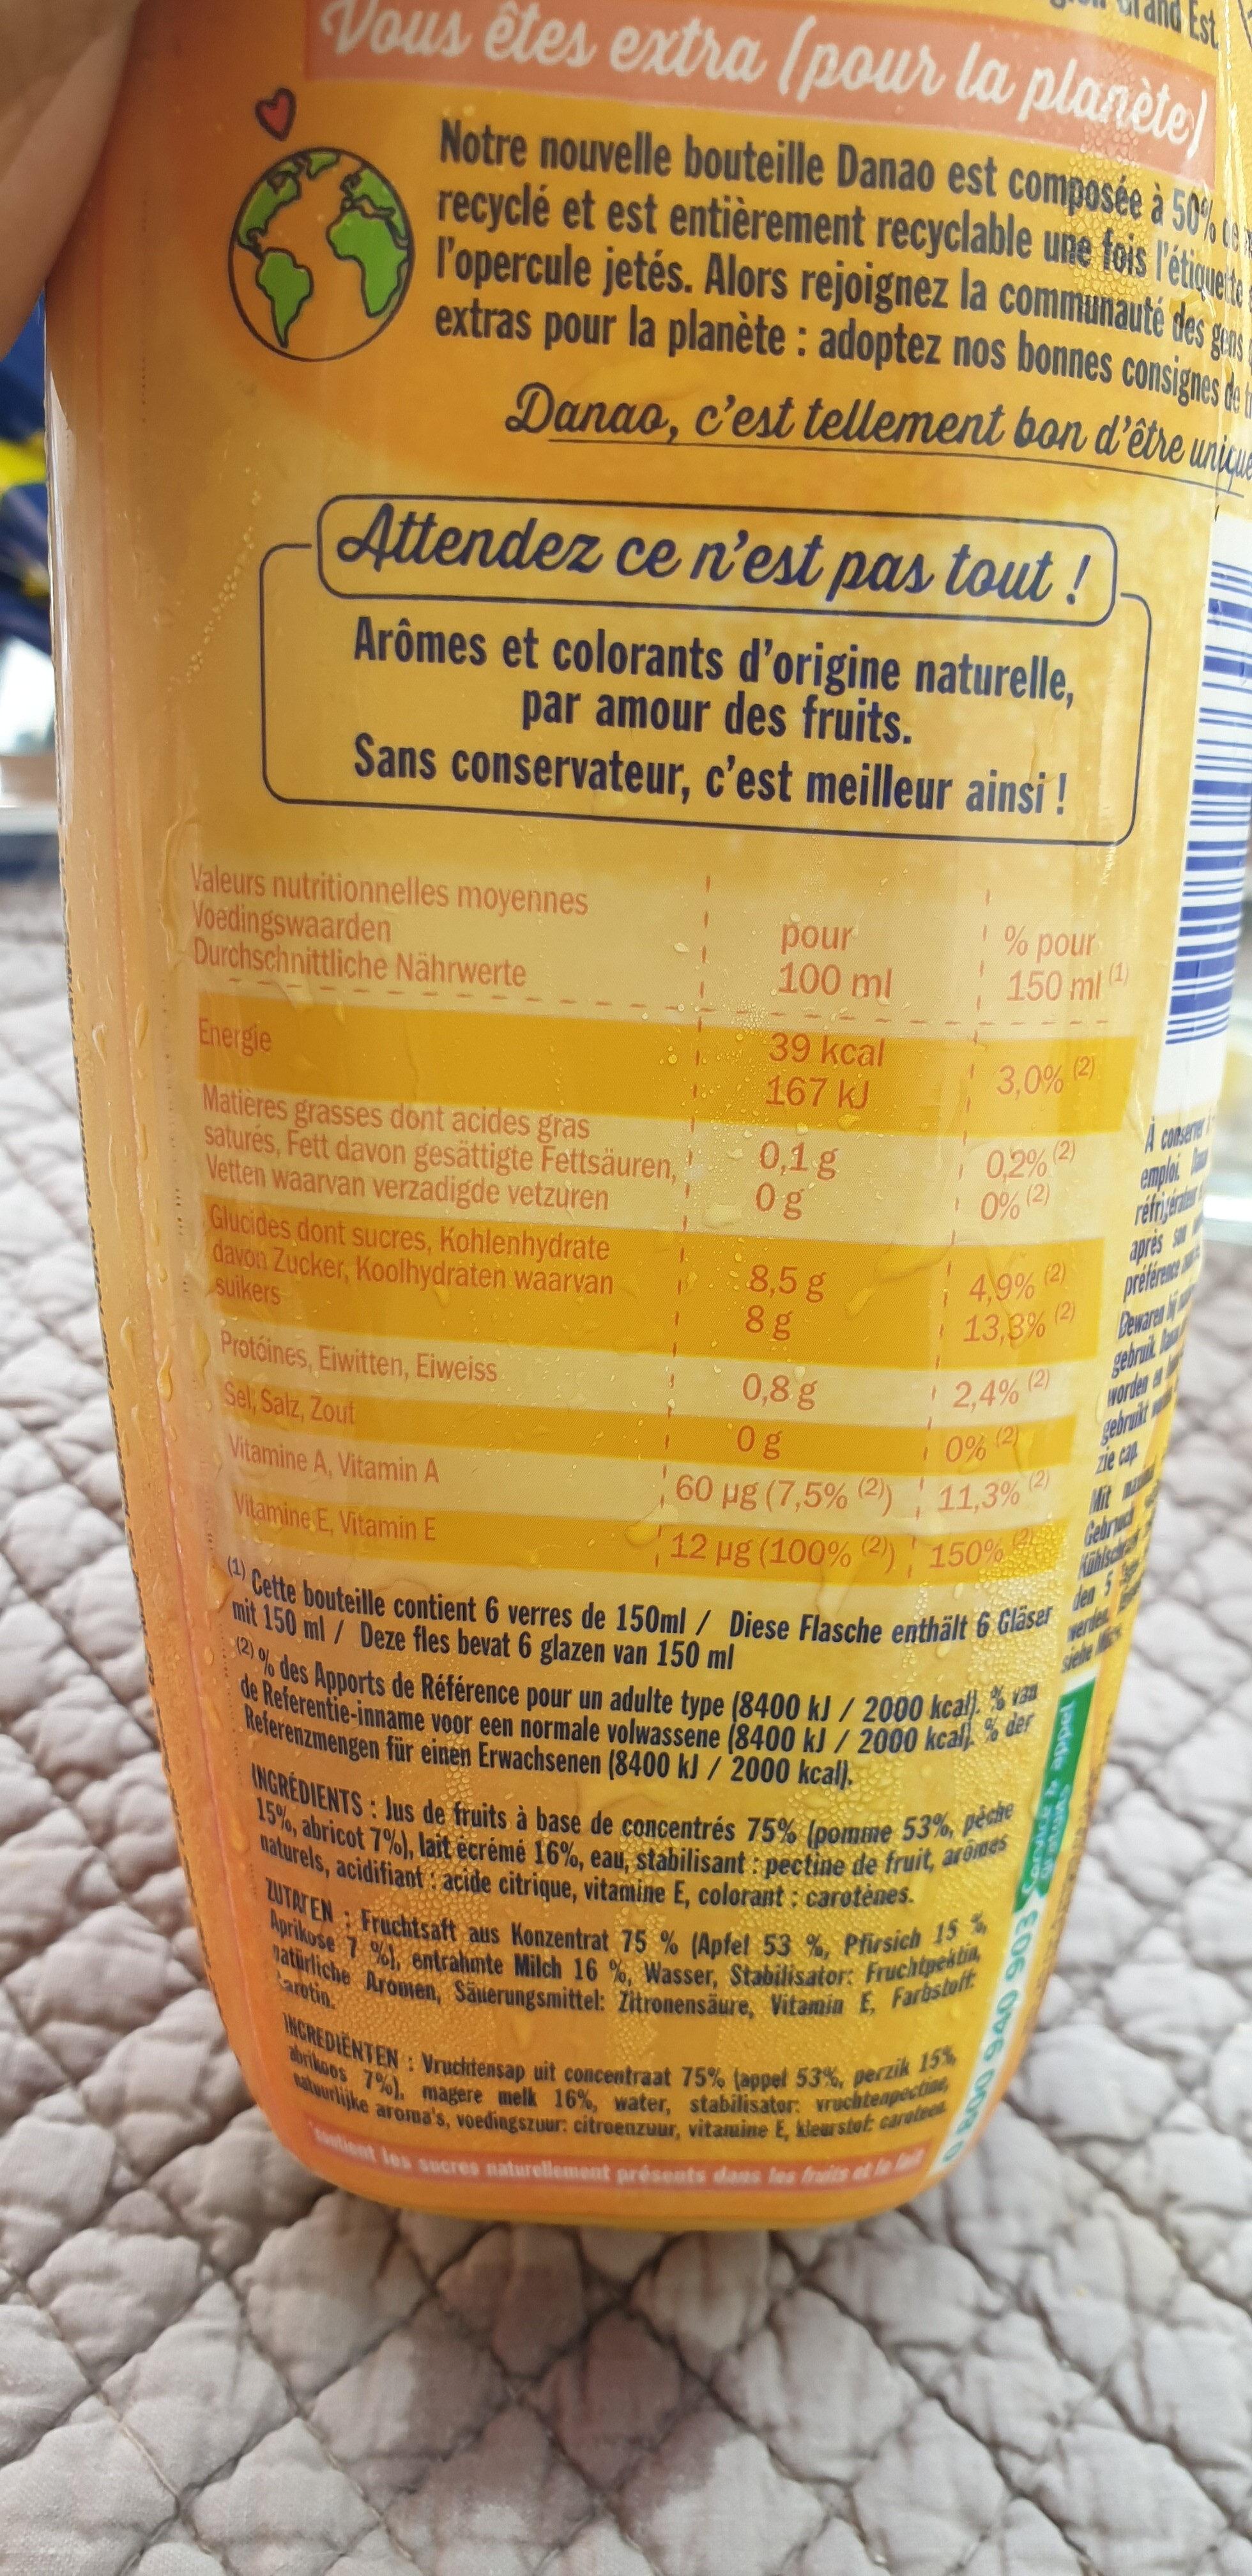 Danao pêche abricot - Informations nutritionnelles